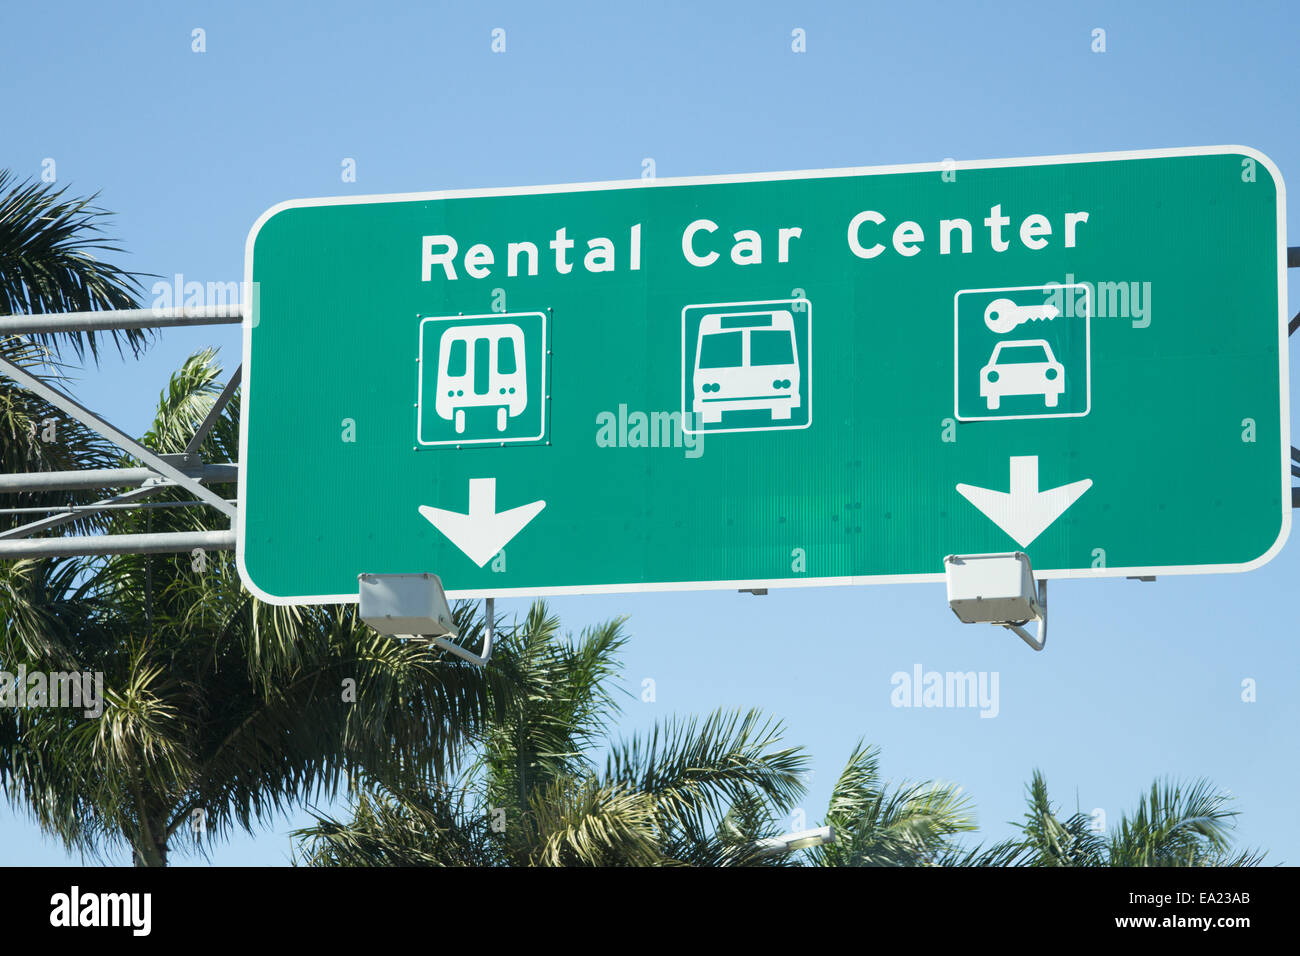 car rental return stockfotos & car rental return bilder - alamy